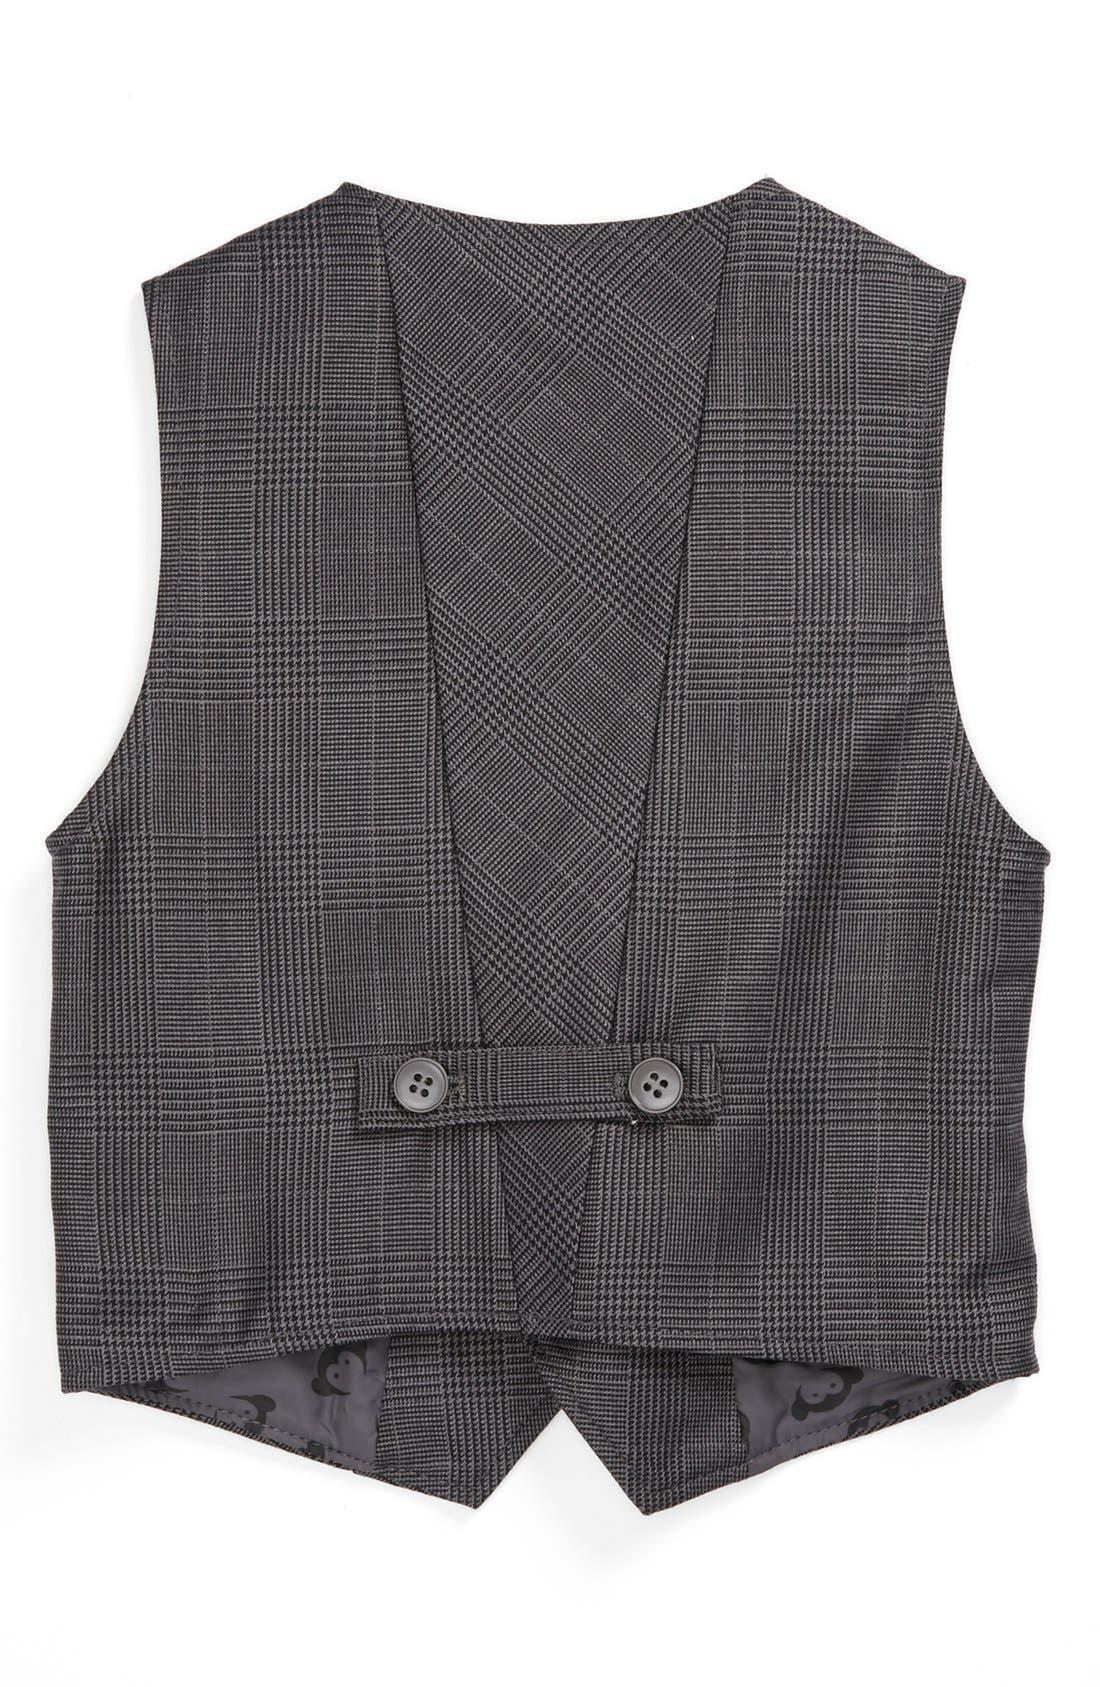 Alternate Image 2  - Appaman Glen Plaid Vest (Toddler Boys)